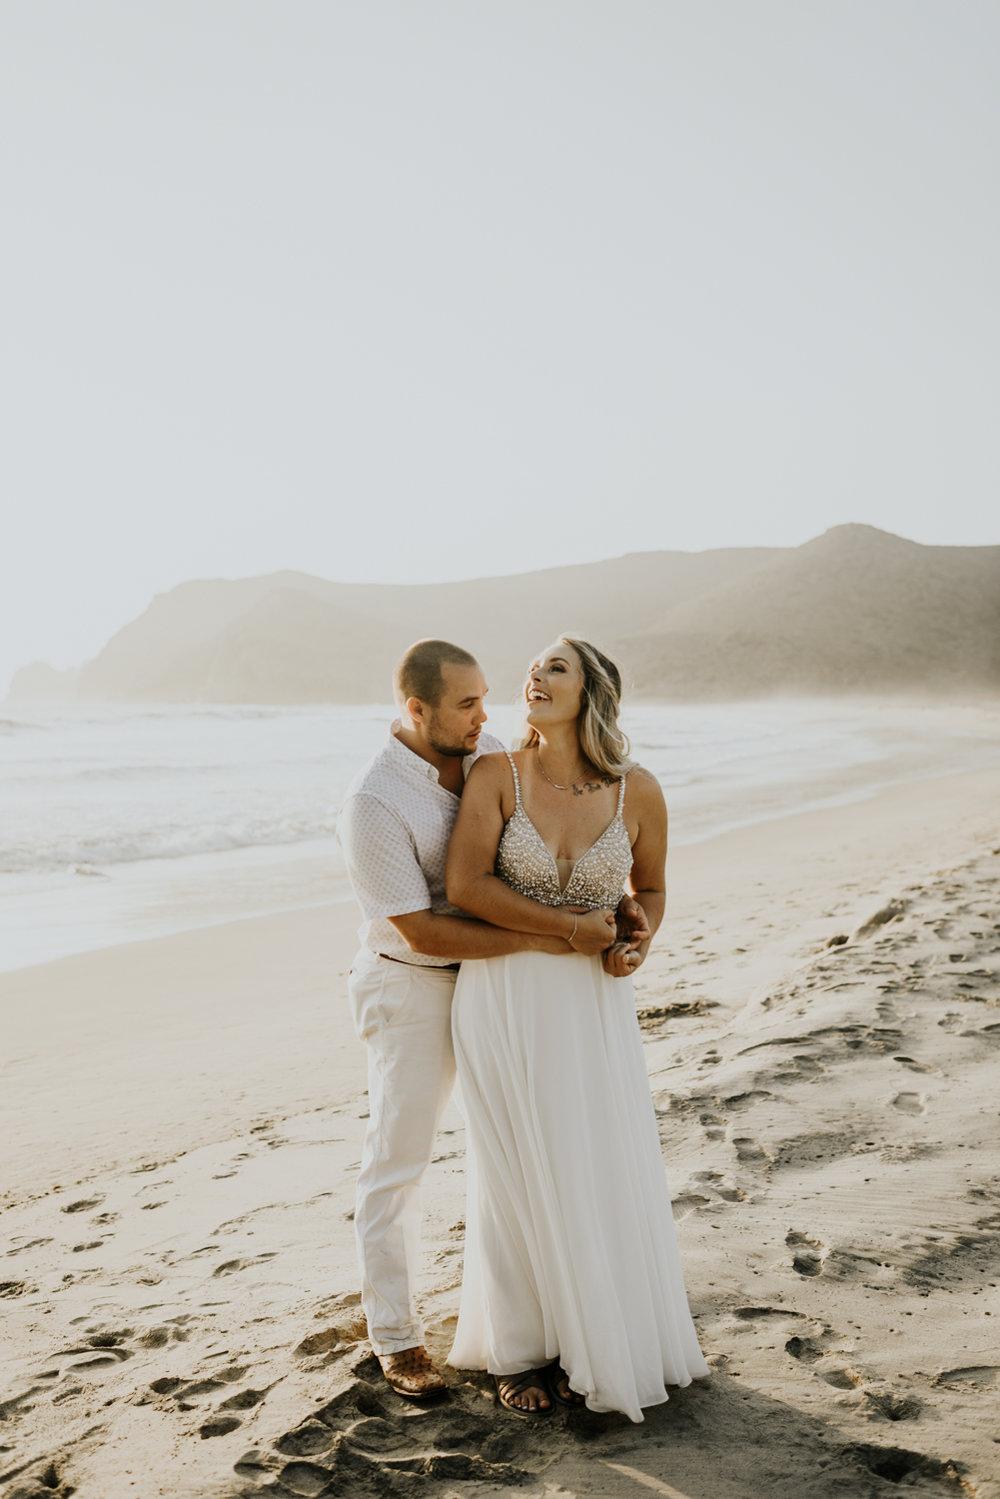 Beach Photos-Intimate Wedding Photographers In Baja California